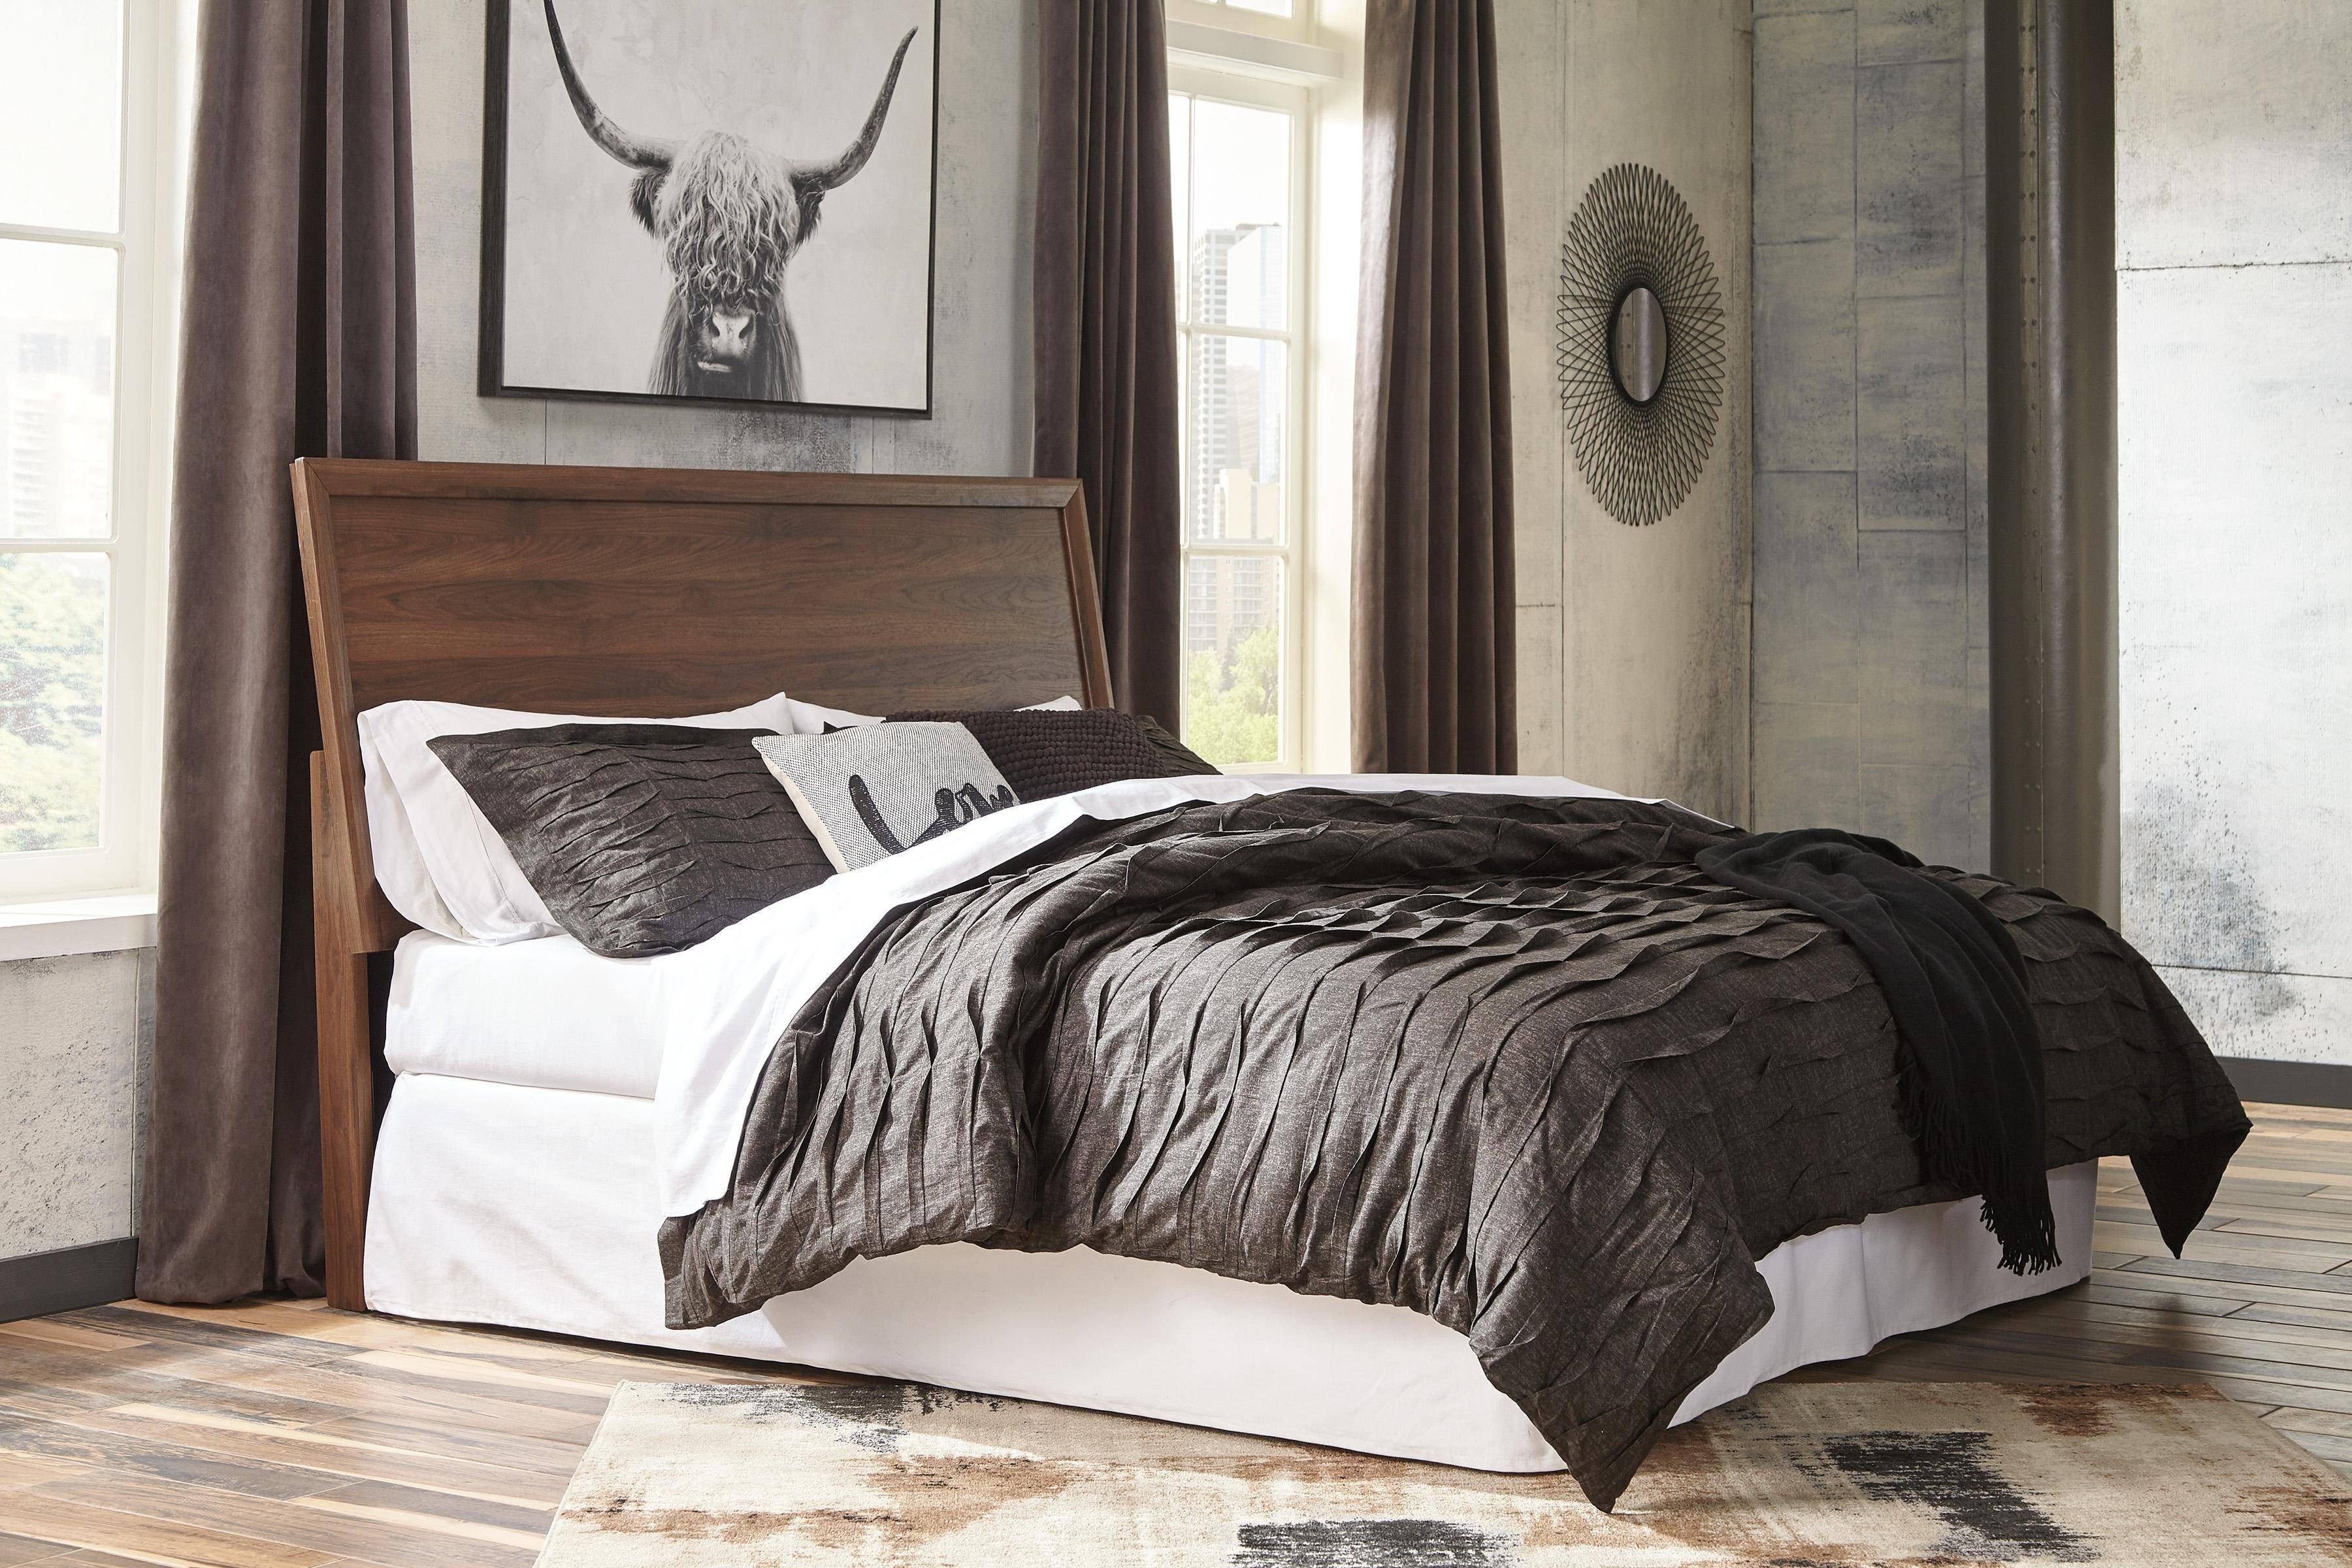 Ashley Black Bedroom Set Awesome ashley Daneston B292 King Size Panel Bedroom Set 6pcs In